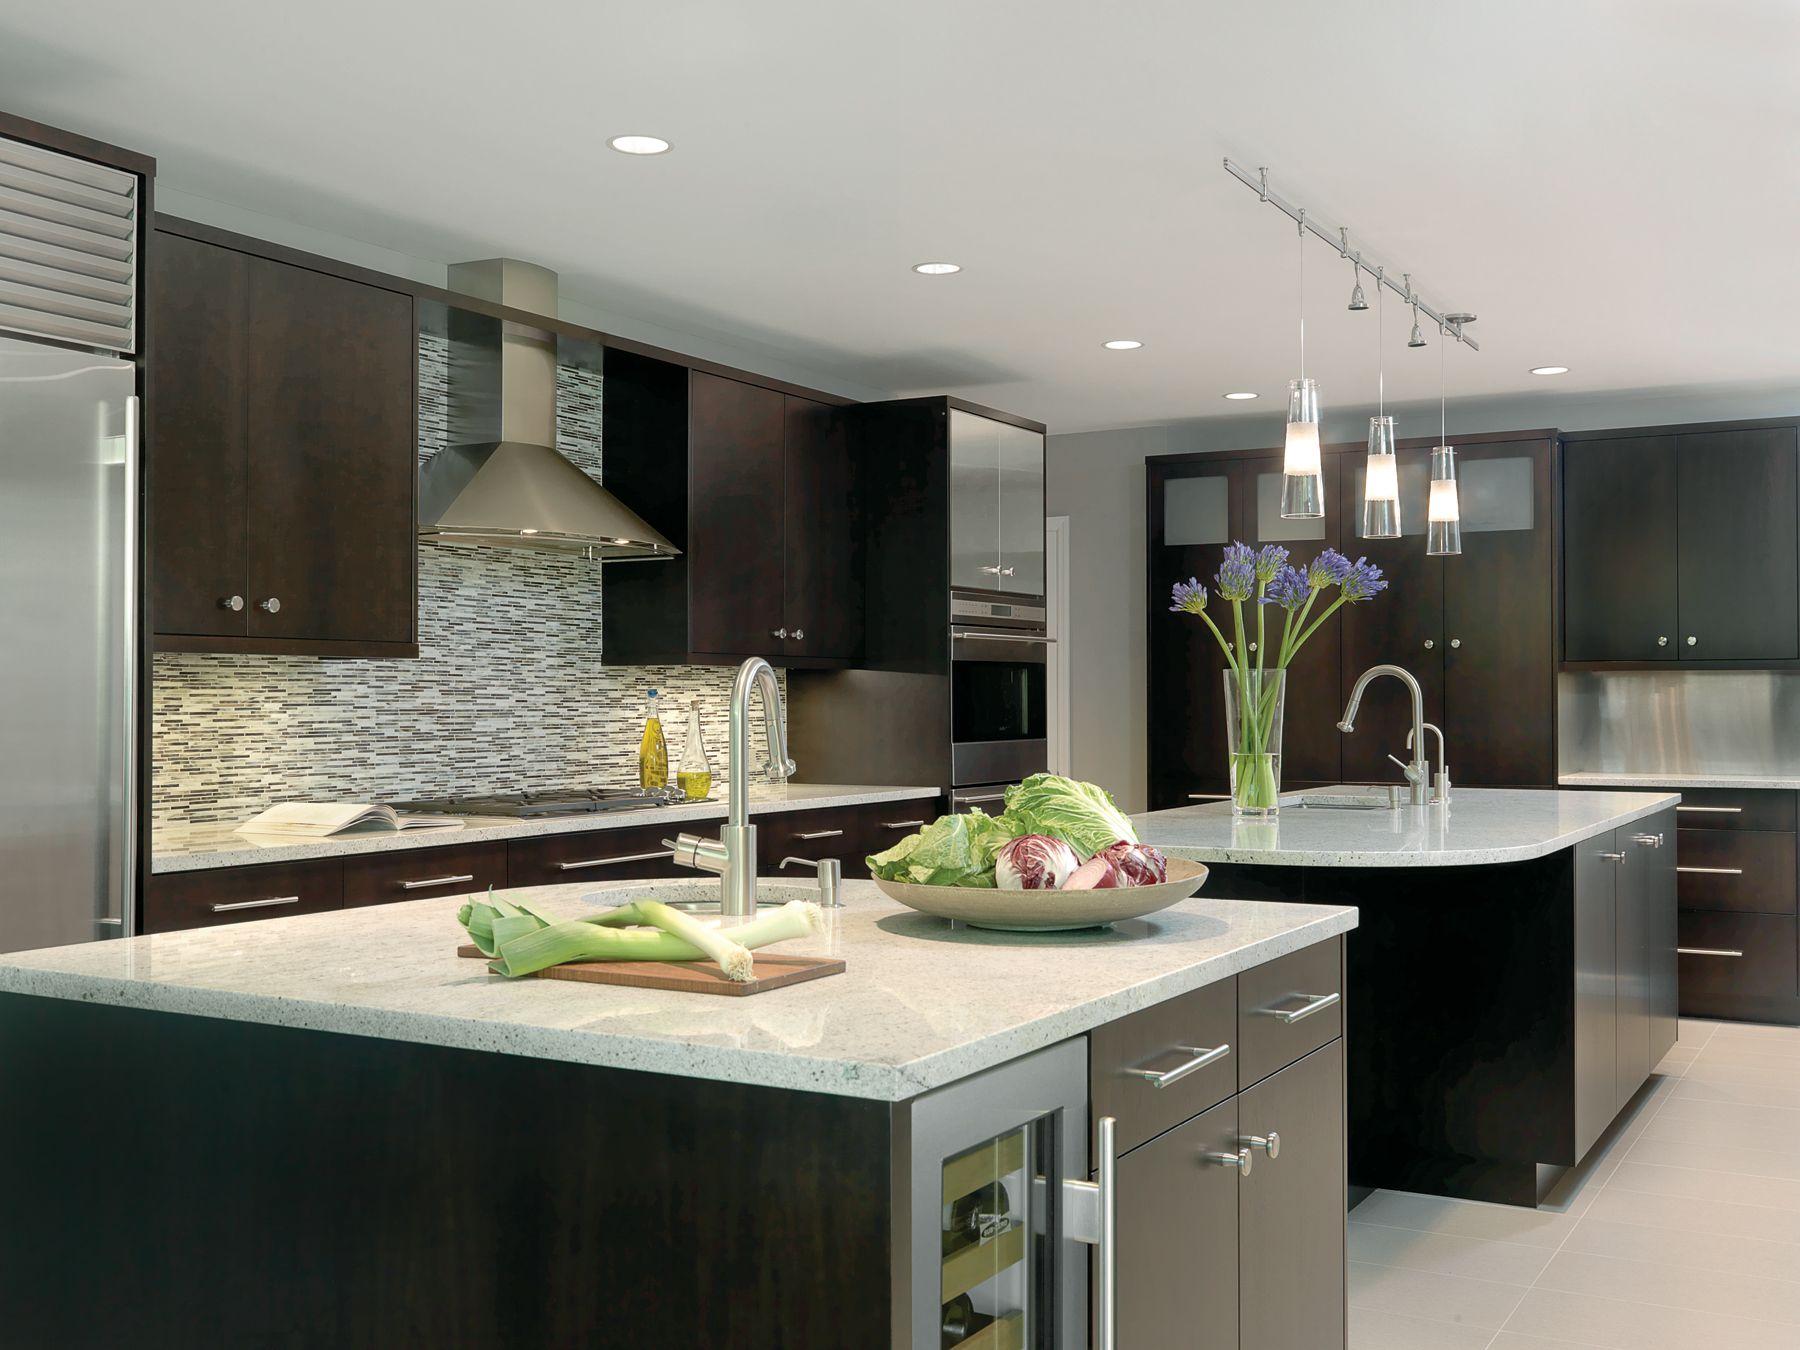 Award Winning Kitchen Layouts Winner Less Than 250 Square Feet Glen Alspaugh Kitchens Ba Interior Design Kitchen Simple Kitchen Design Kitchen Layout